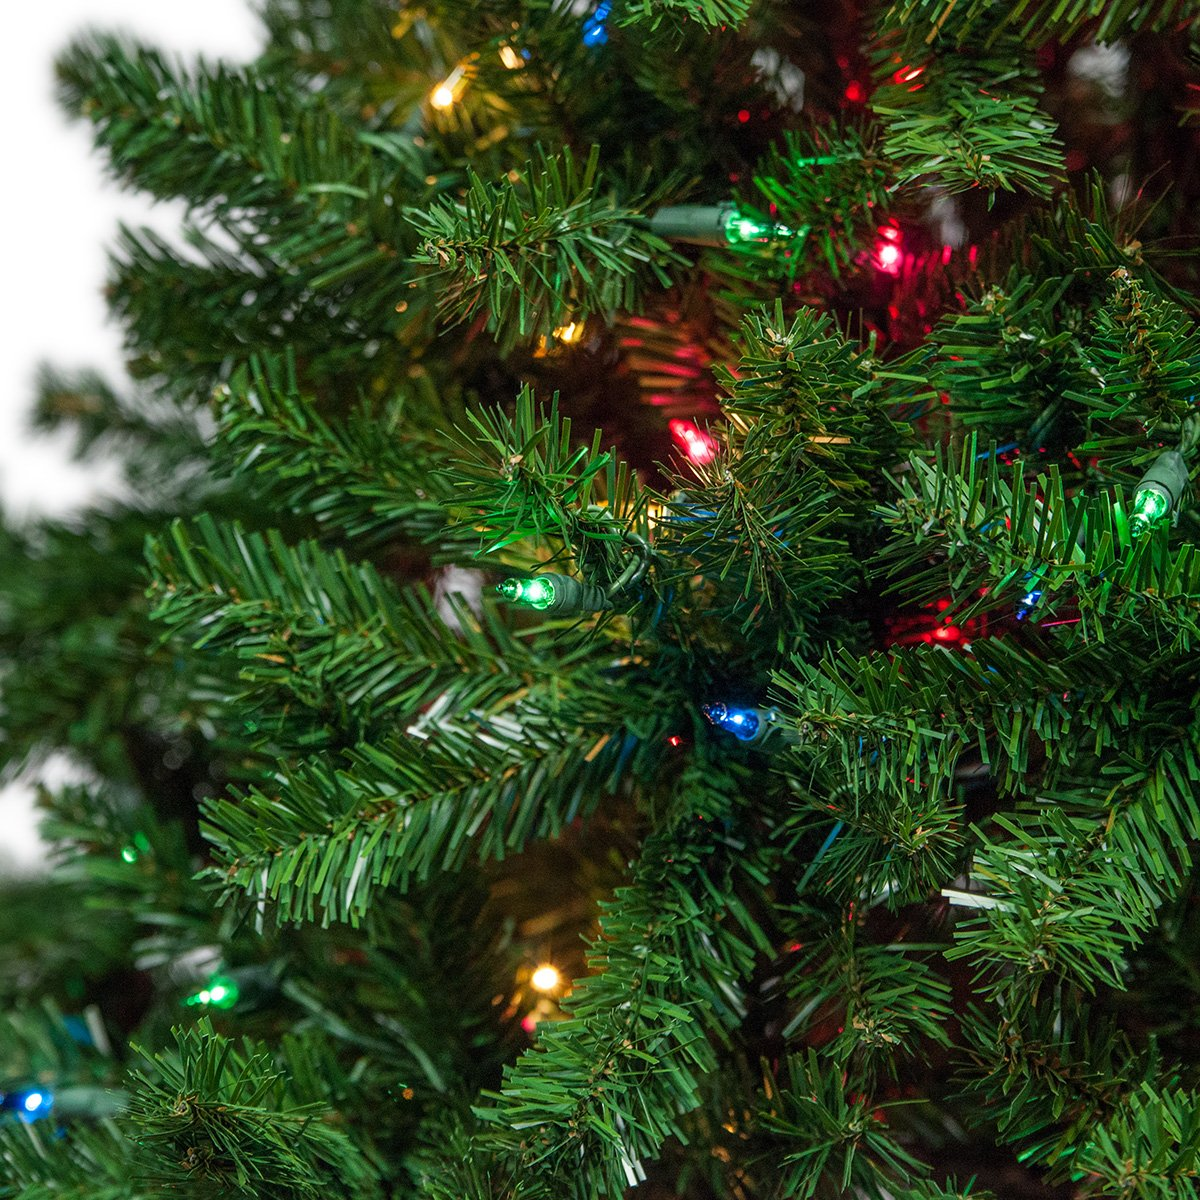 Amazon.com: Douglas Fir Prelit Christmas Tree Artificial Christmas ...